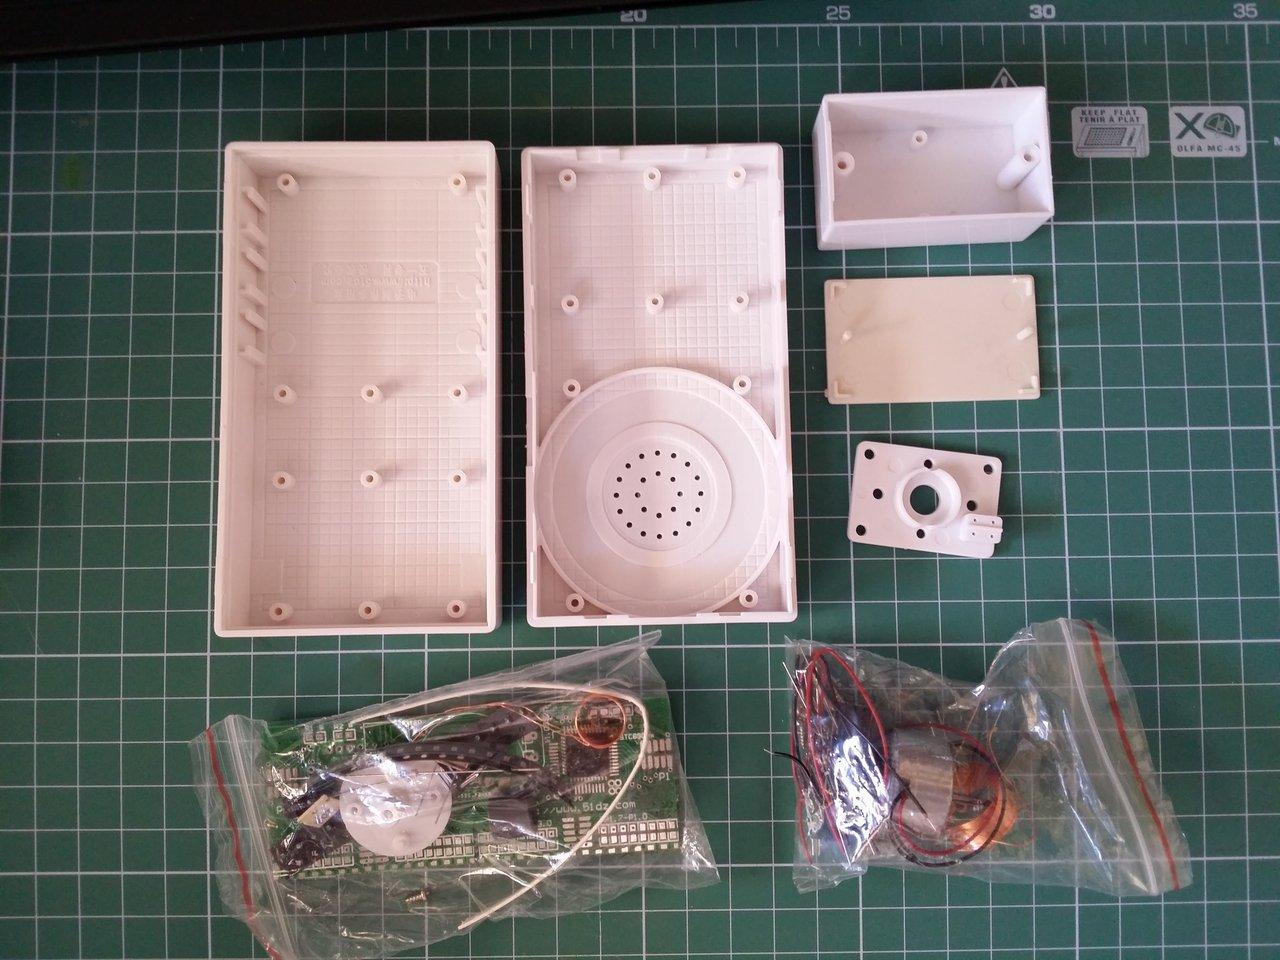 Rotating LED display kit